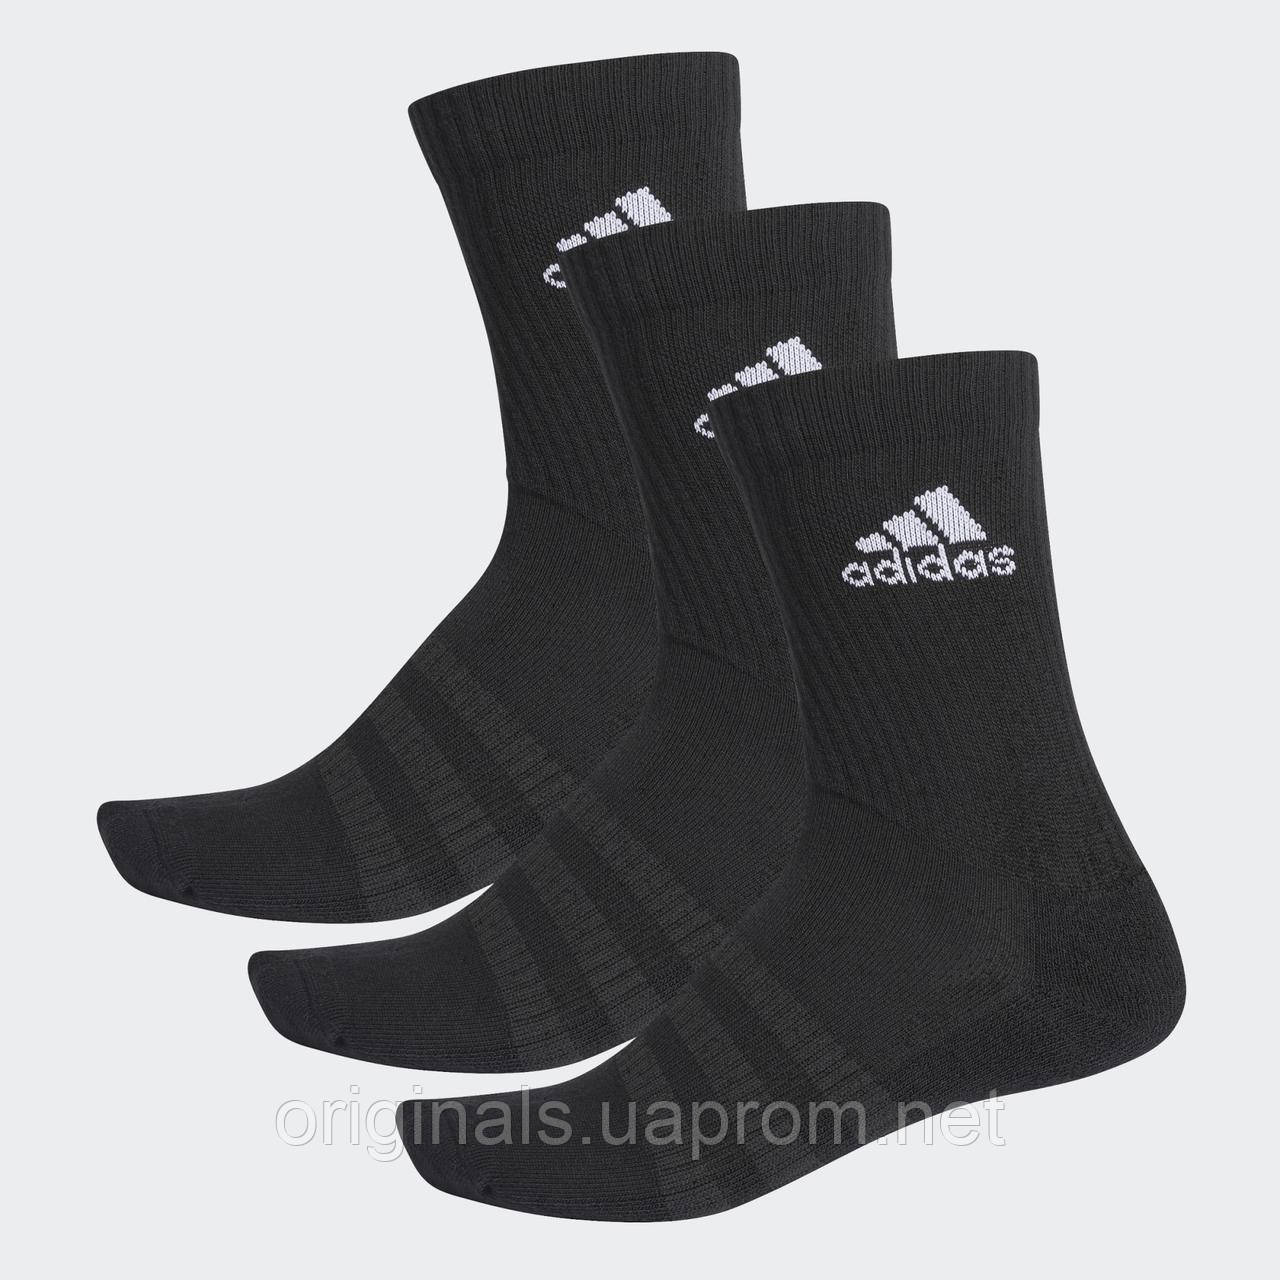 Носки спортивные Adidas Cushioned Crew 3PP DZ9357